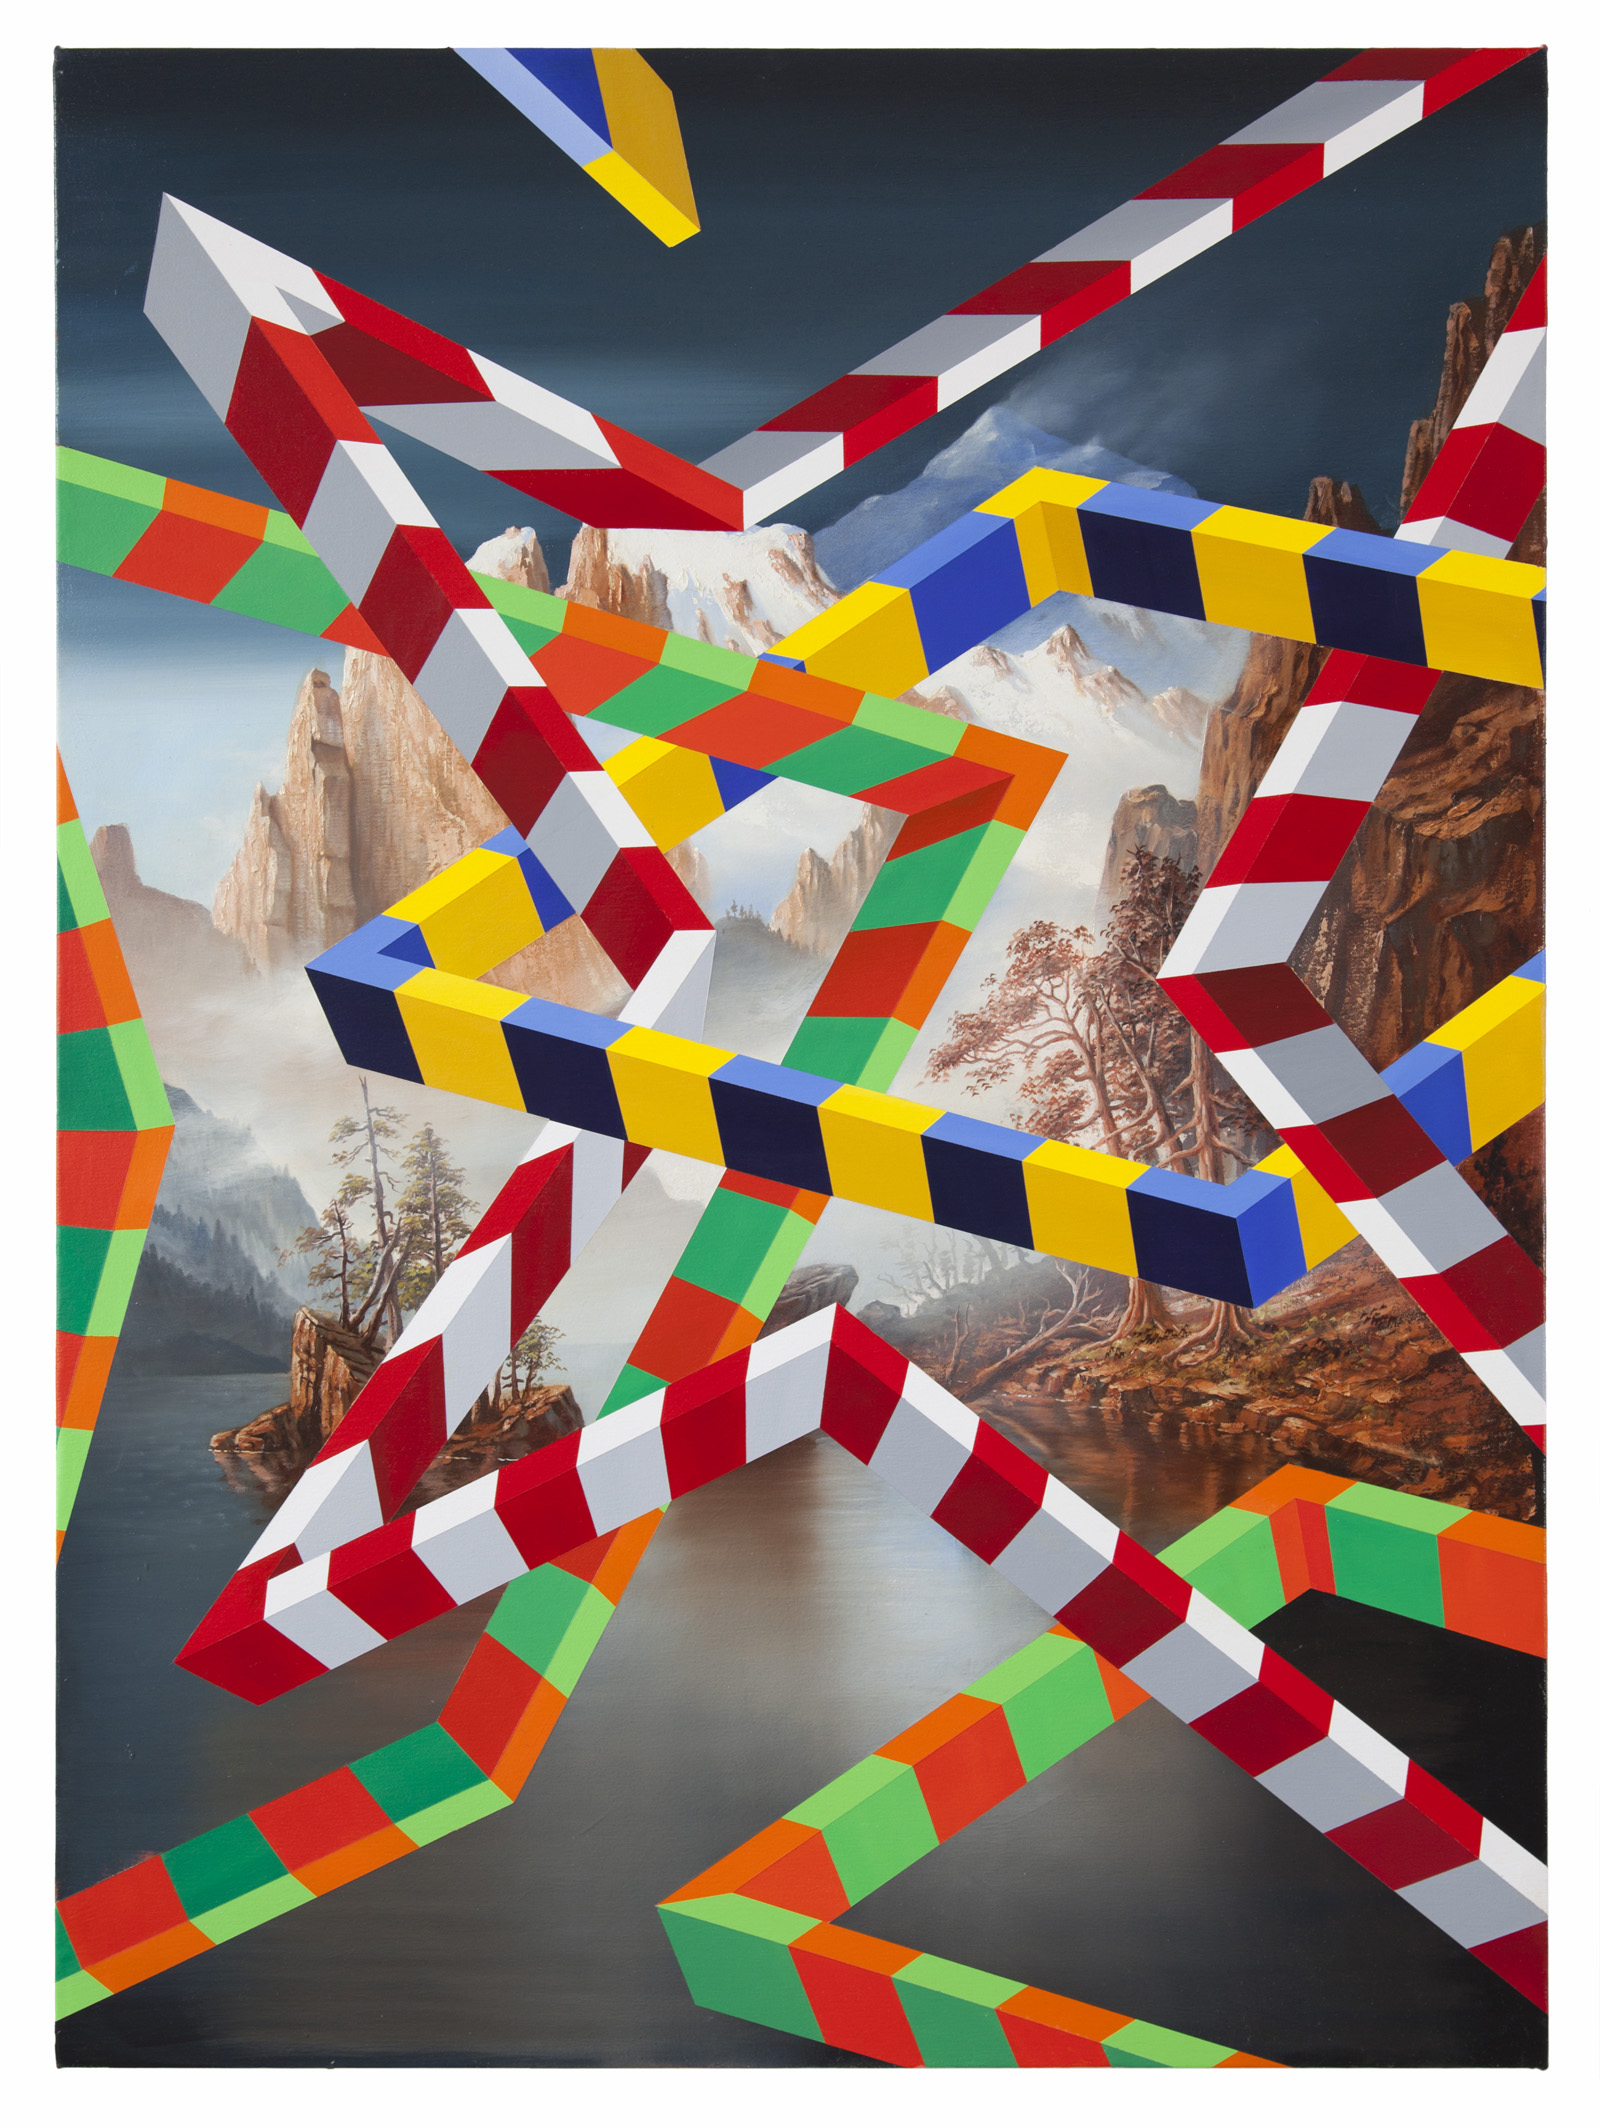 PETER DAVERINGTON   Pailsades  2018 Oil and acrylic on canvas 122 x 91 cm